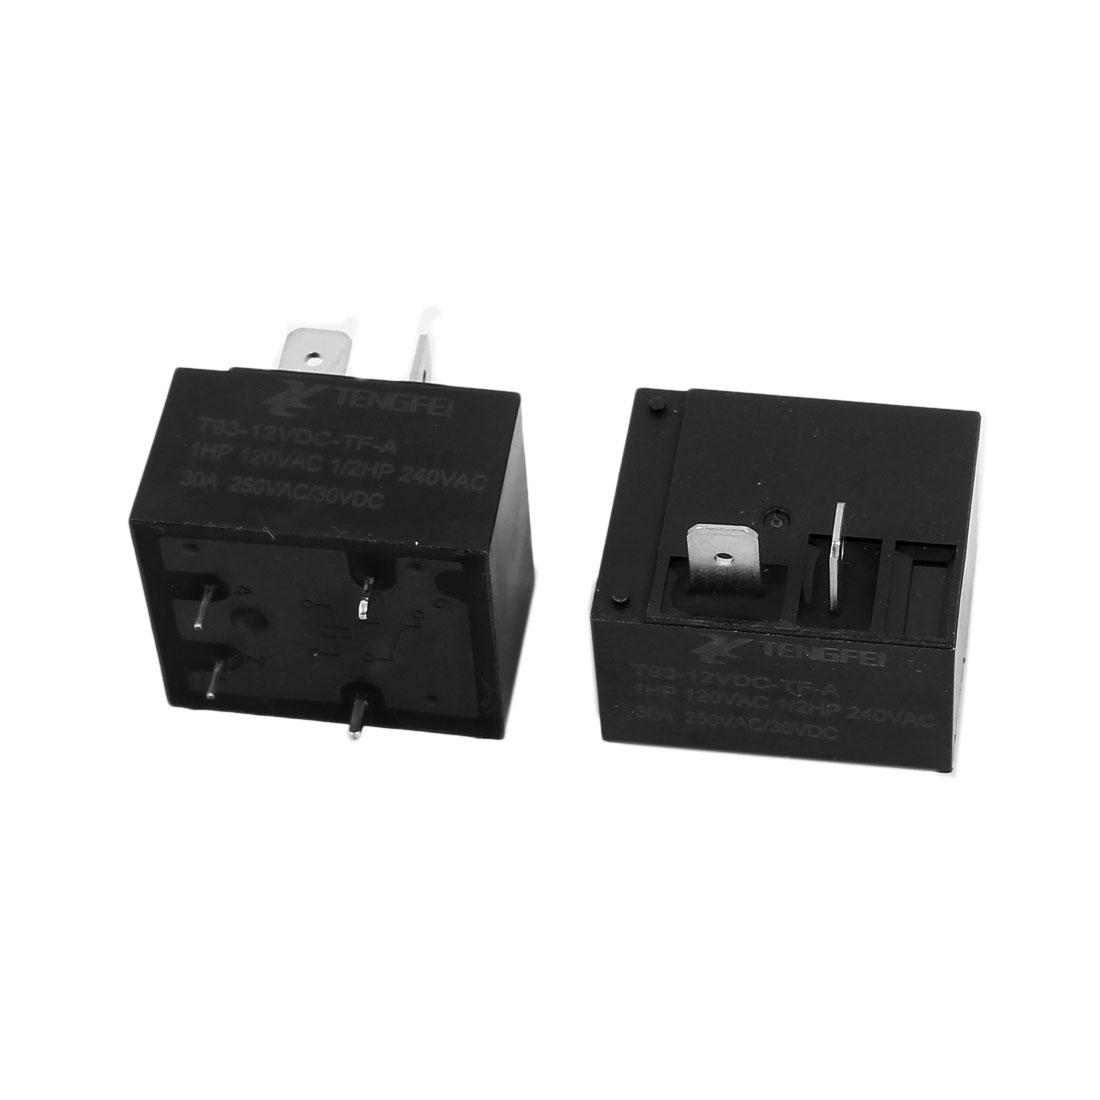 2Pcs T93 DC12V 15A 4 Terminal SPST NO Miniature Power Coil Electromagnetic Relay